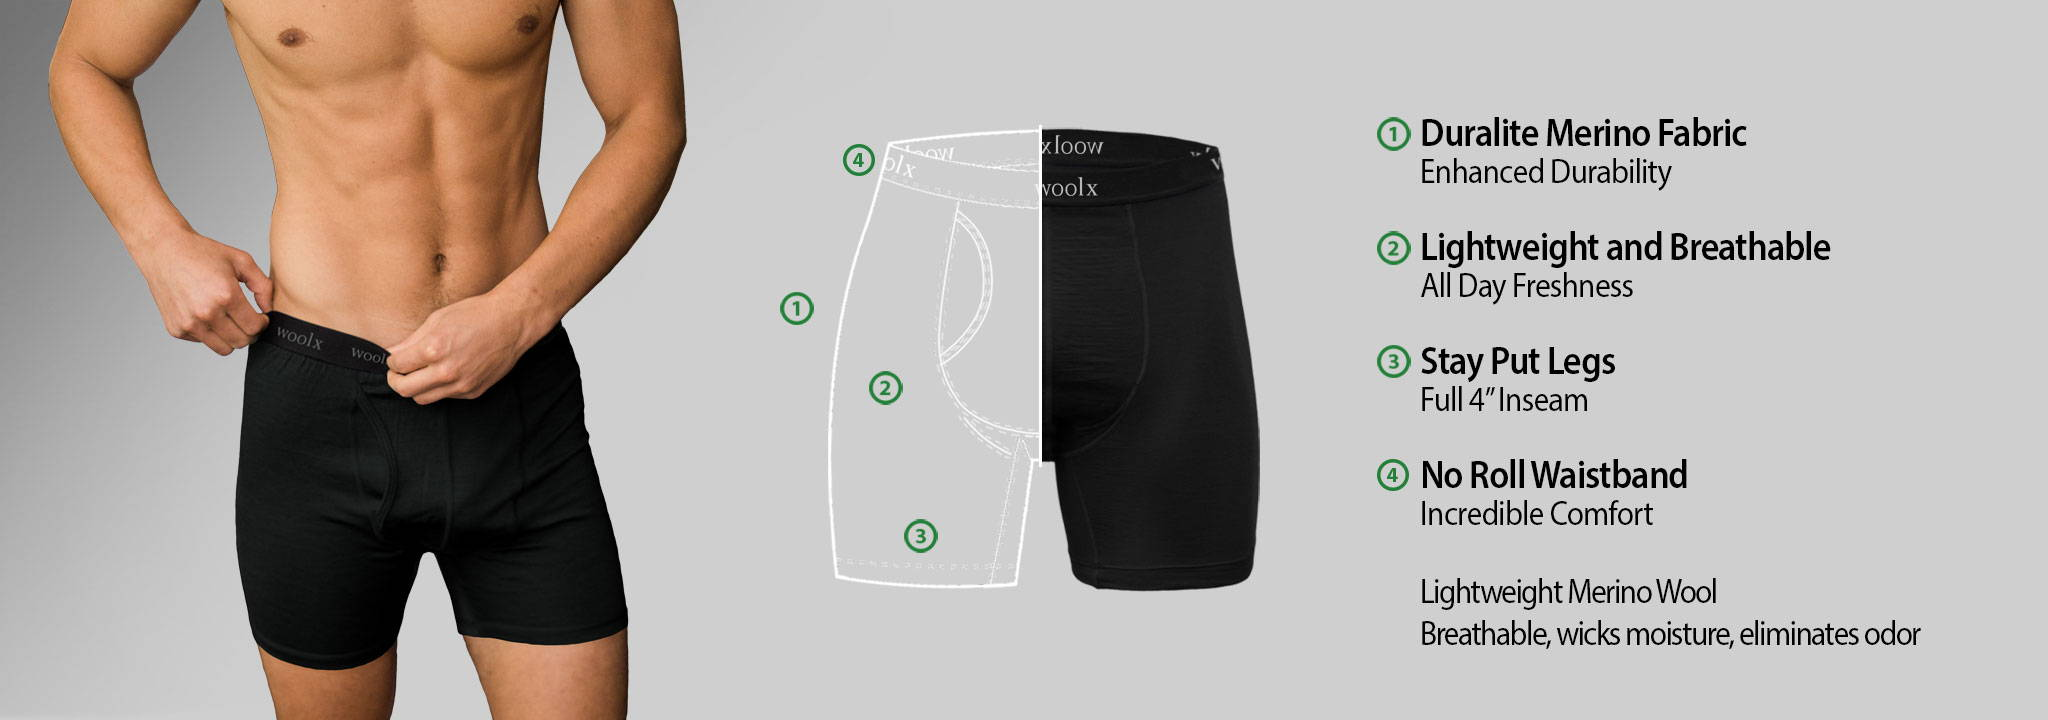 9721730a3a972 Men s Merino Wool Boxer Briefs - Durable - Lightweight - Free Shipping